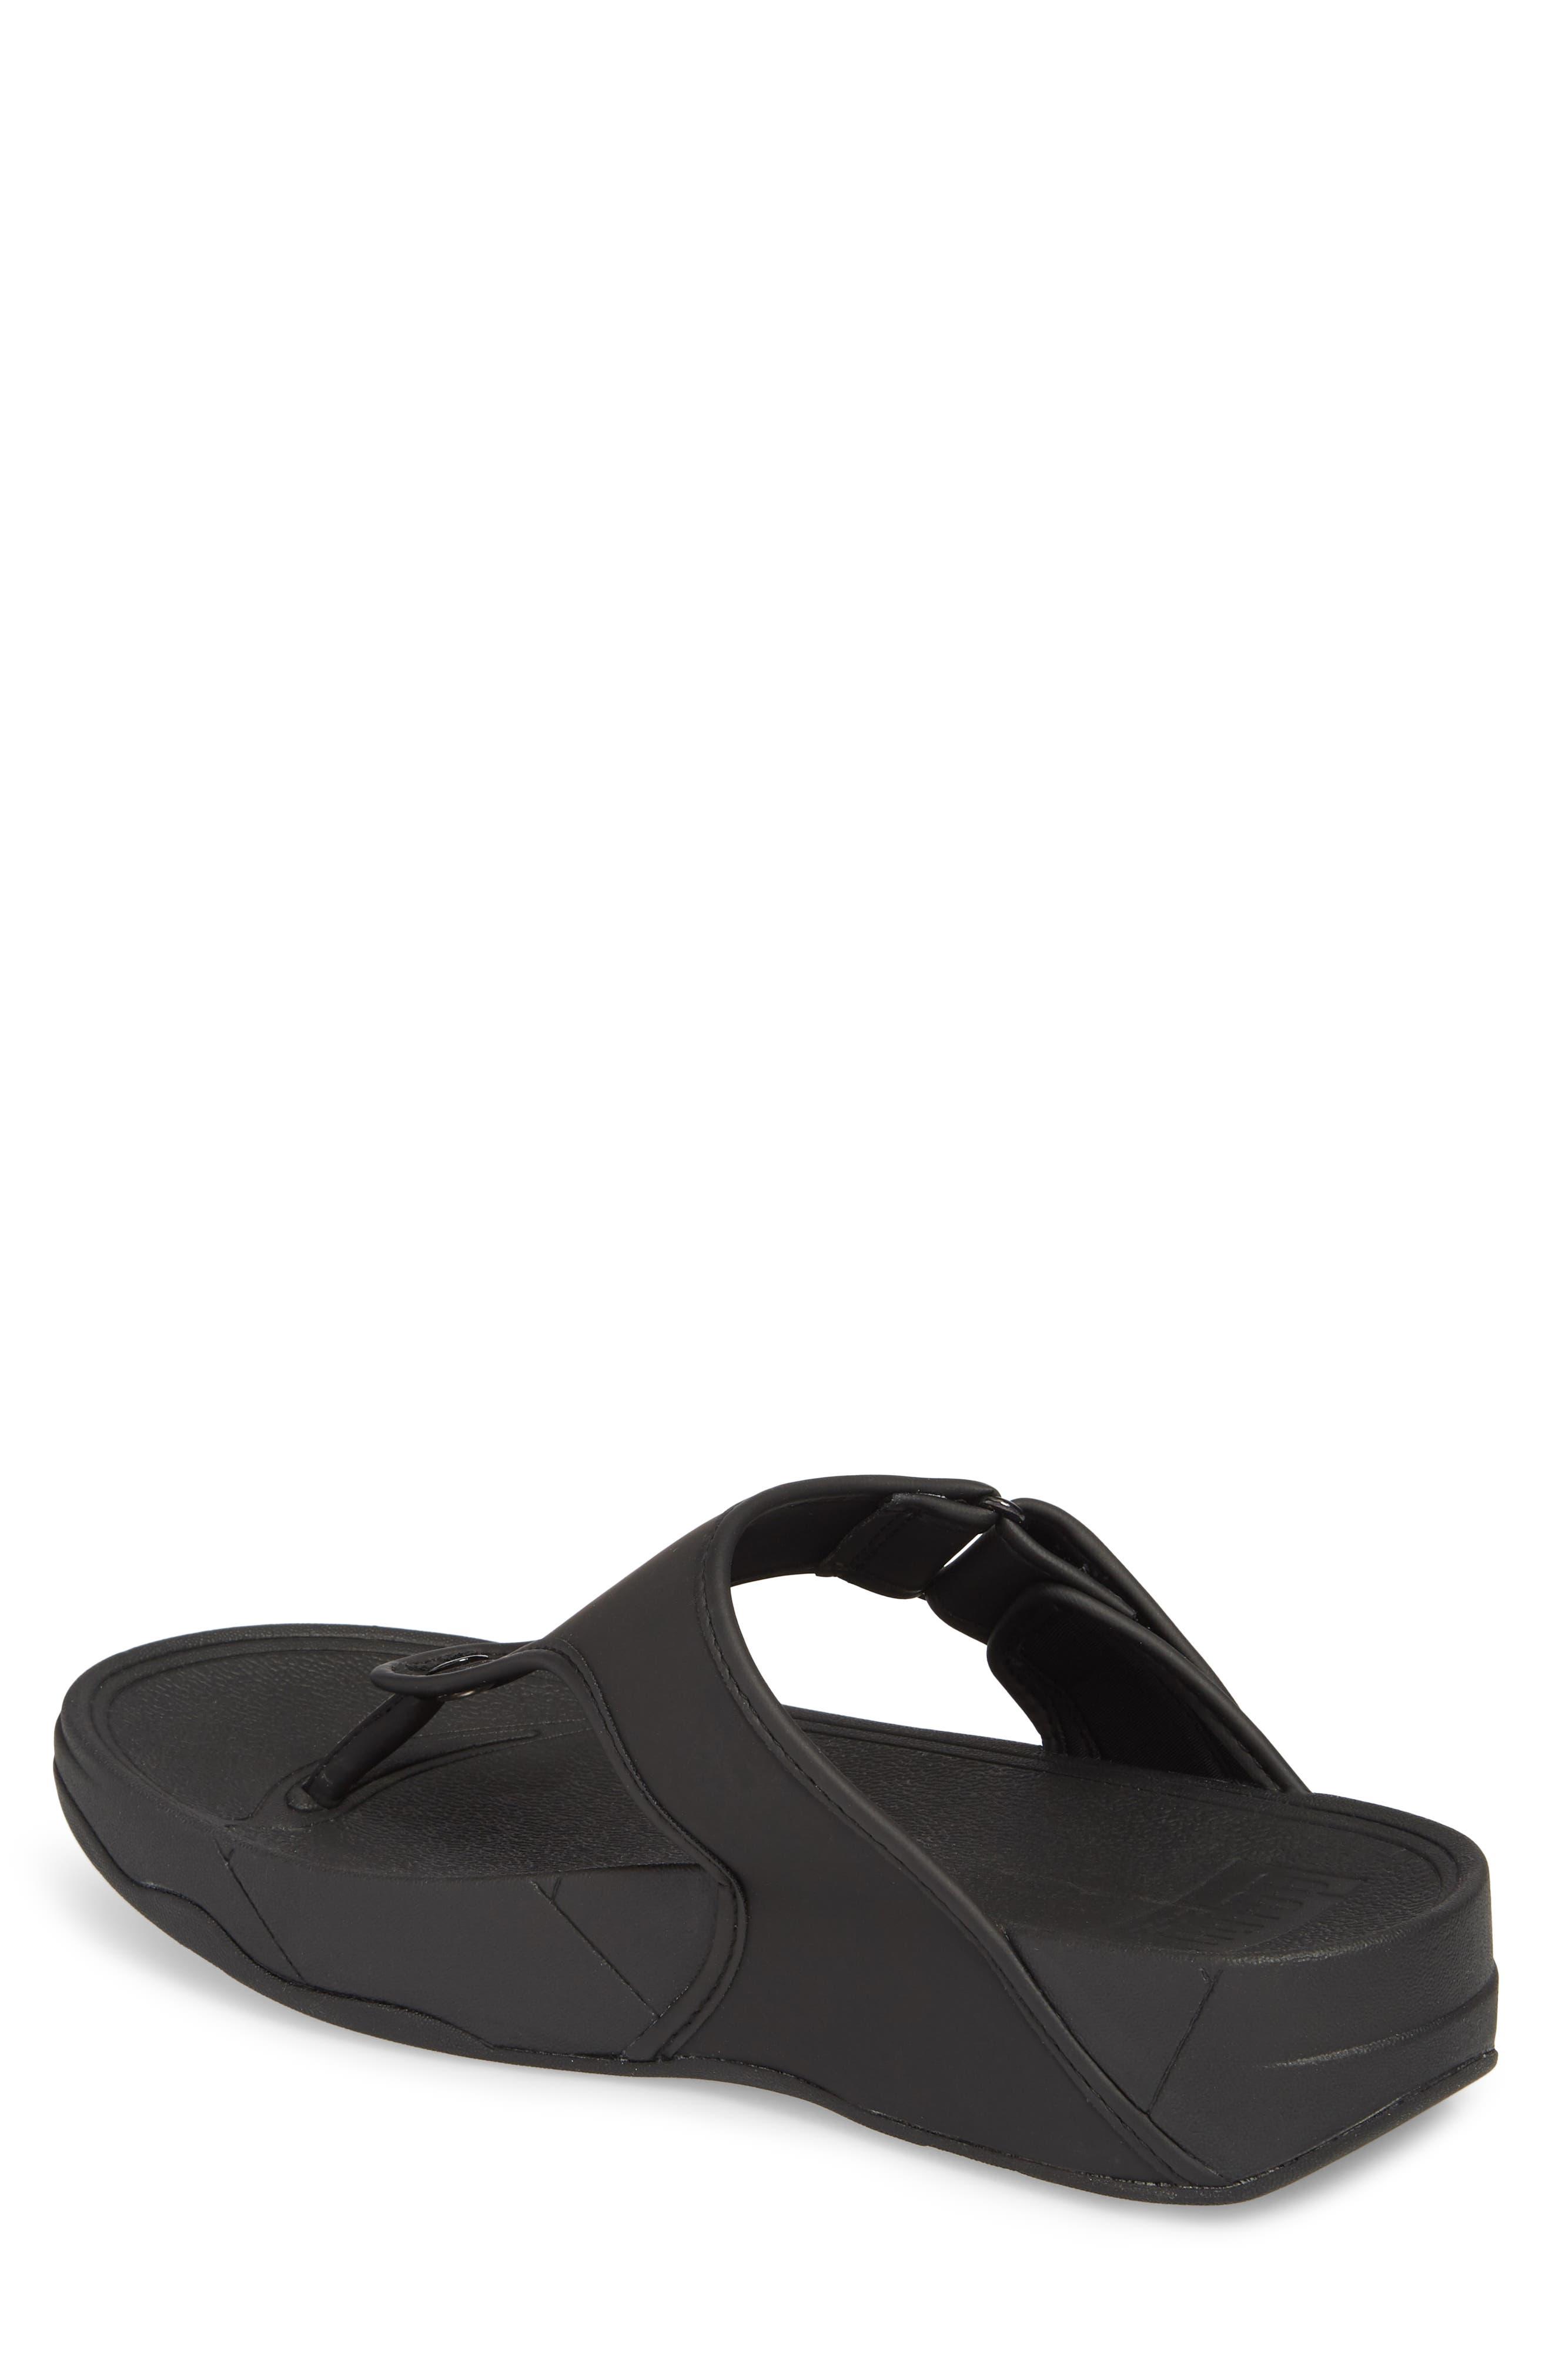 FITFLOP, Trakk<sup>™</sup> II Sandal, Alternate thumbnail 2, color, BLACK NEOPRENE